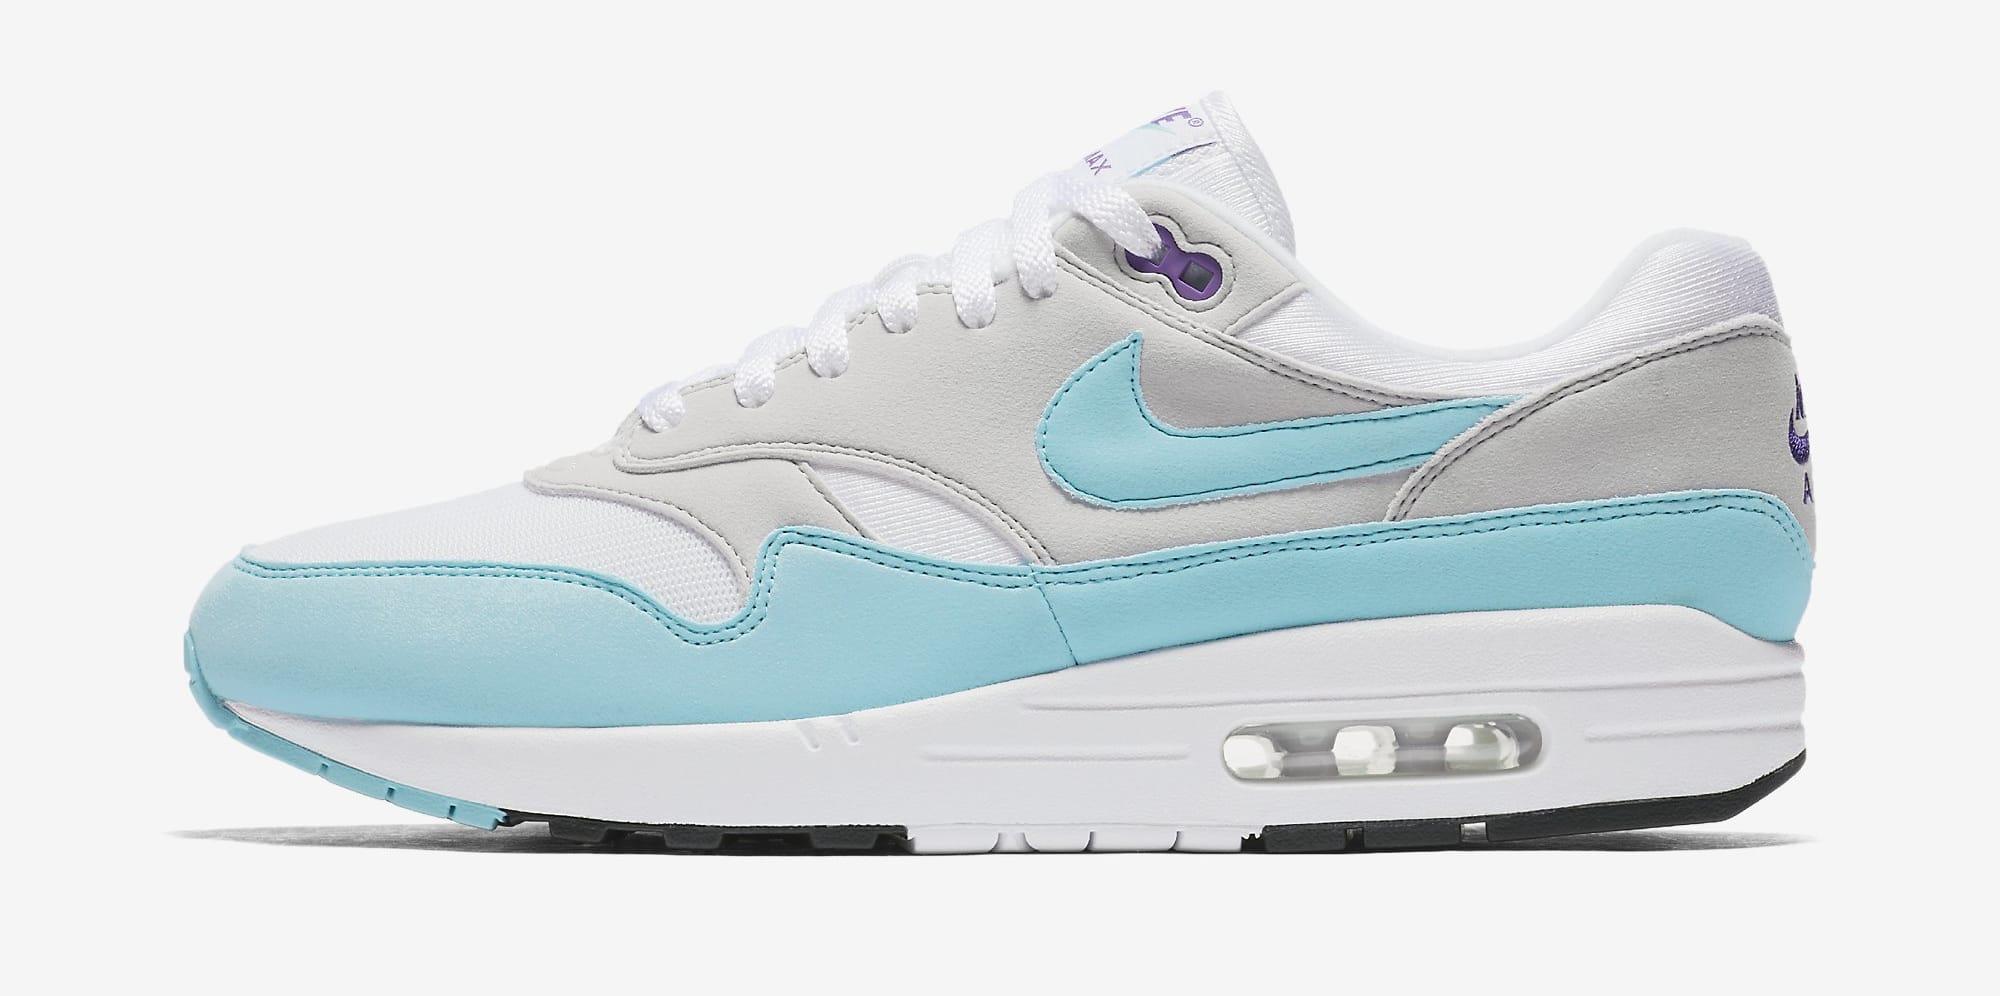 Nike Air Max 1 Anniversary 'Aqua' 908375 105 Release Date